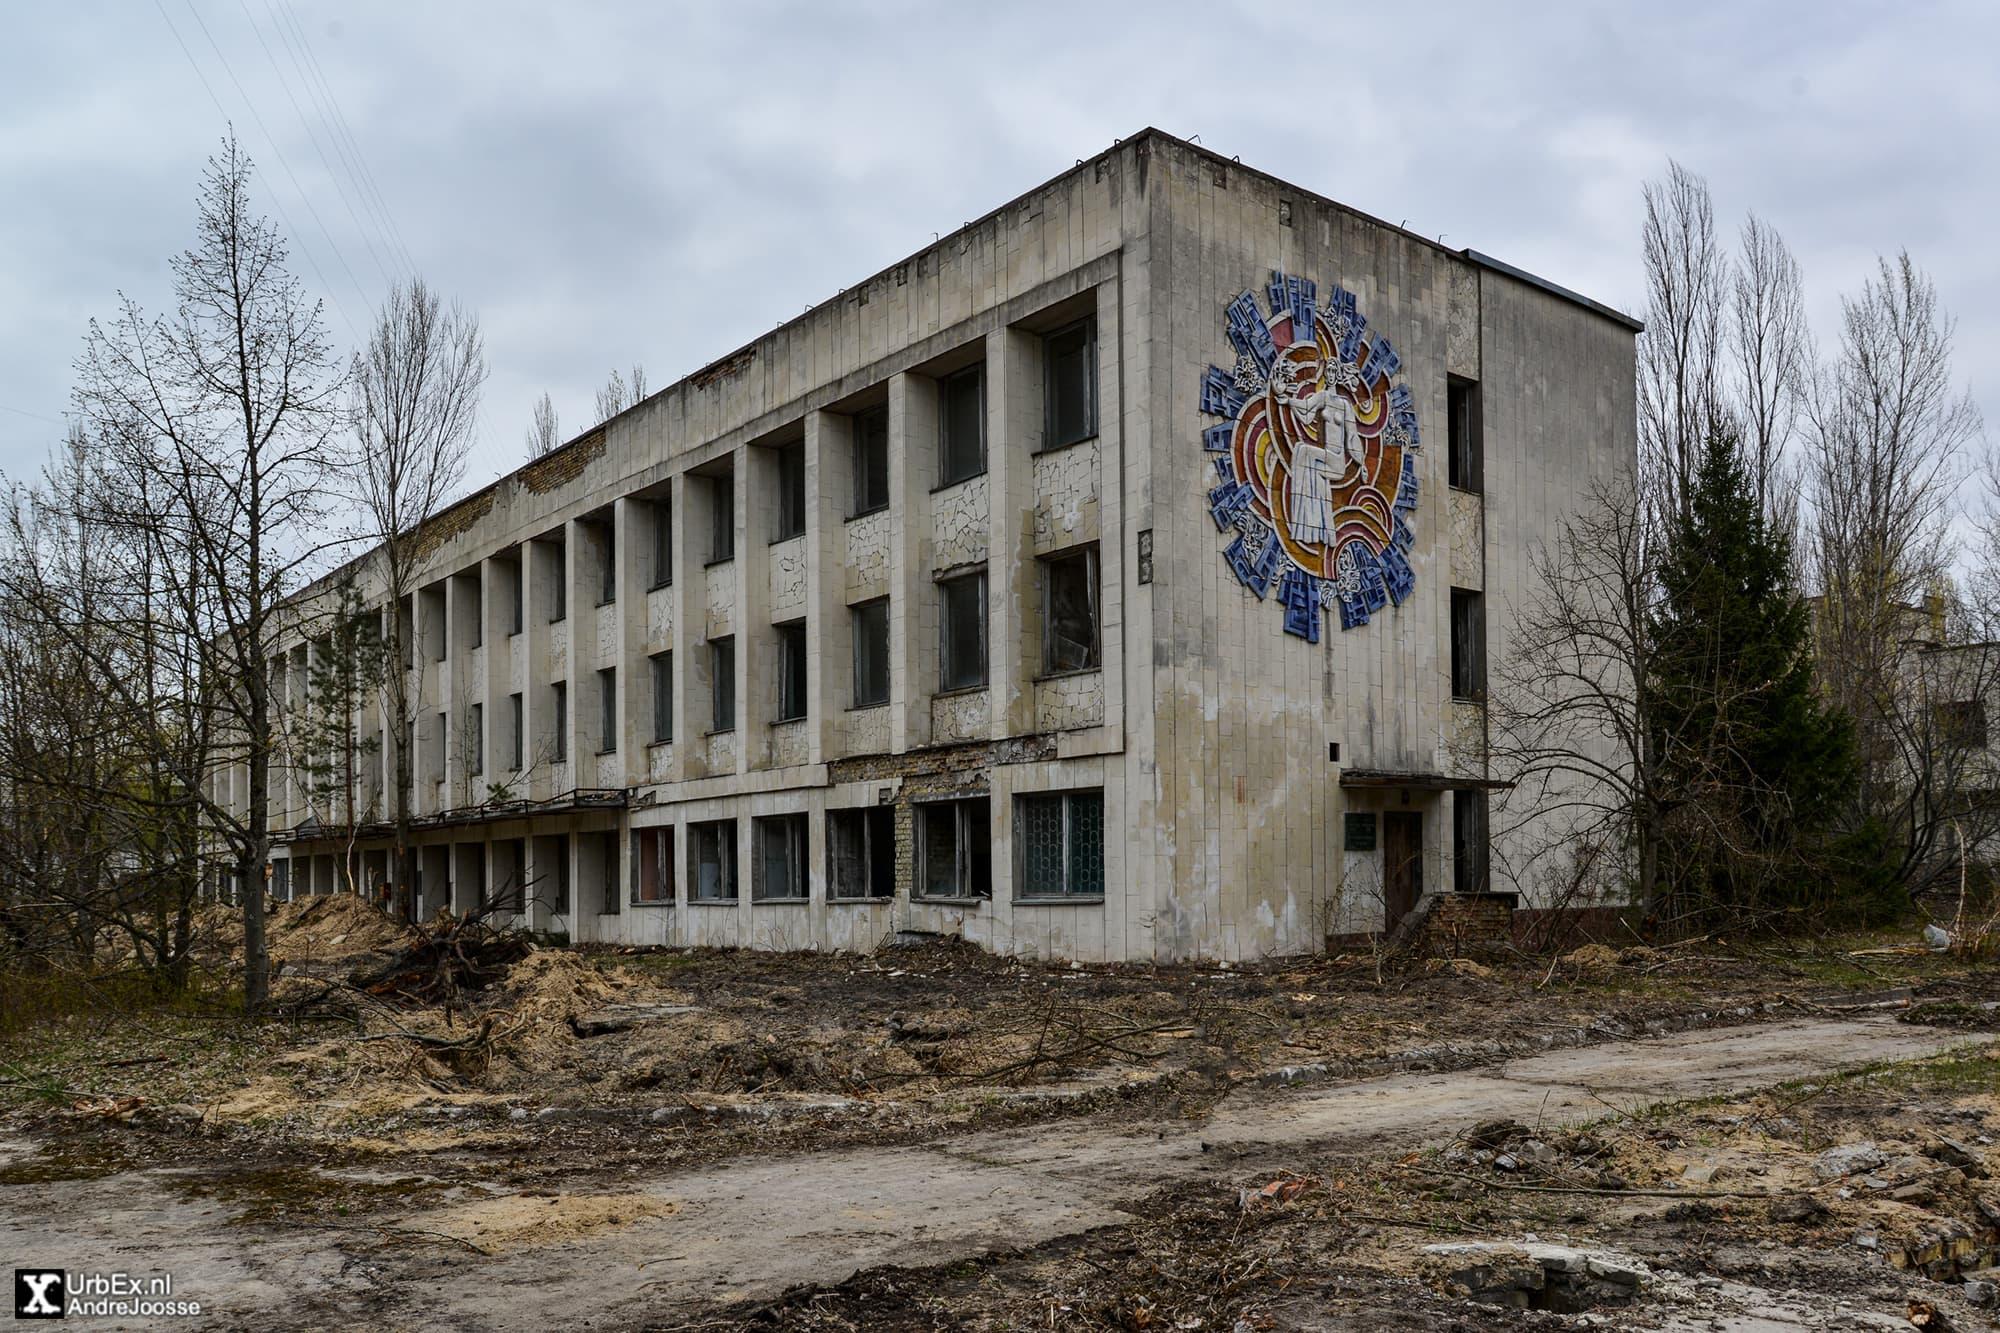 Pripyat Retail: The Post Office